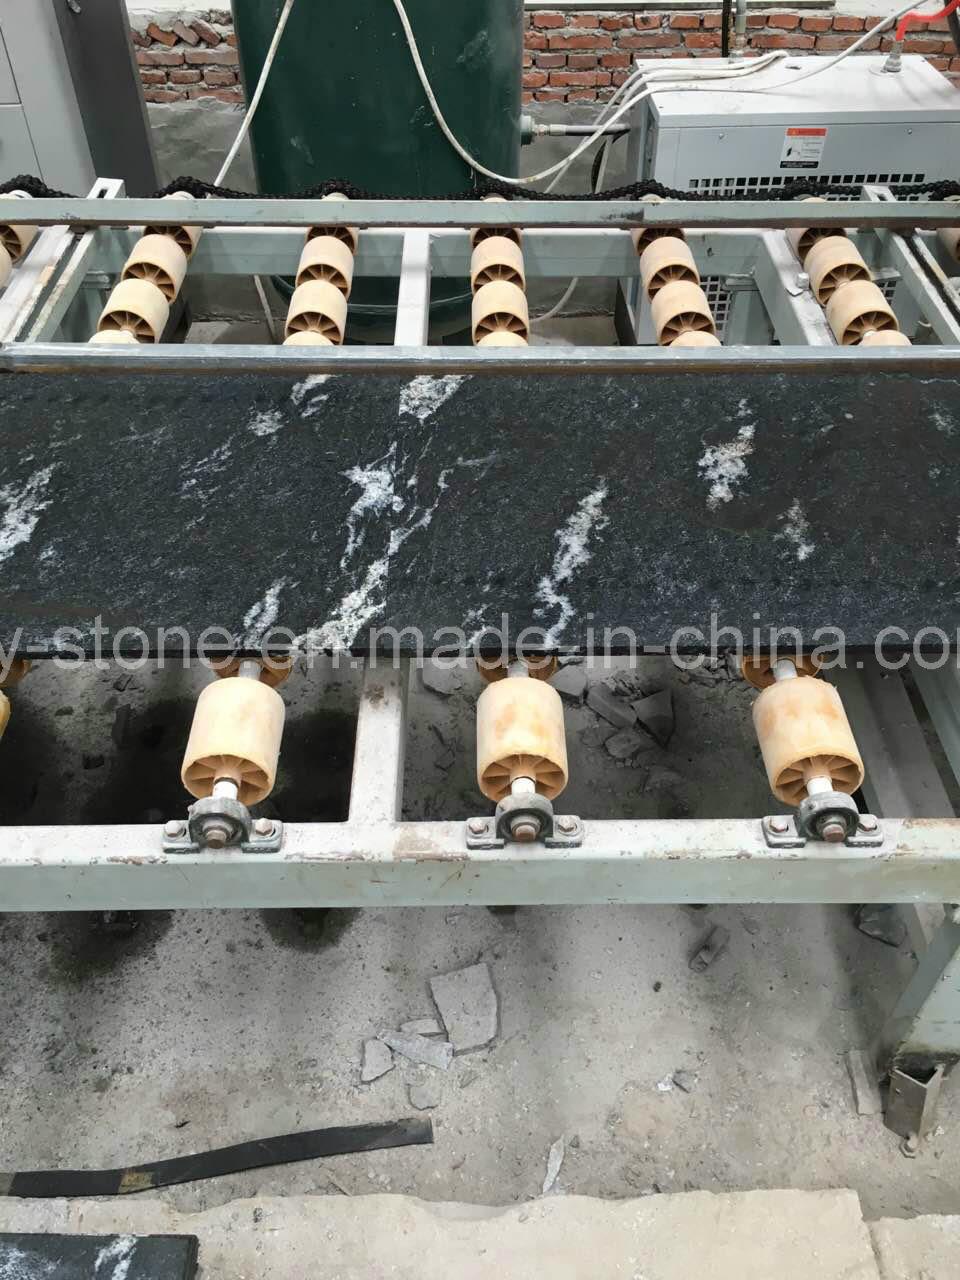 Chinese Snow Grey/Black/Jet Mist Granite for Floor/Wall/Stair/Step/Paver/Kerbstone/Landscape/Palisade/Countertop